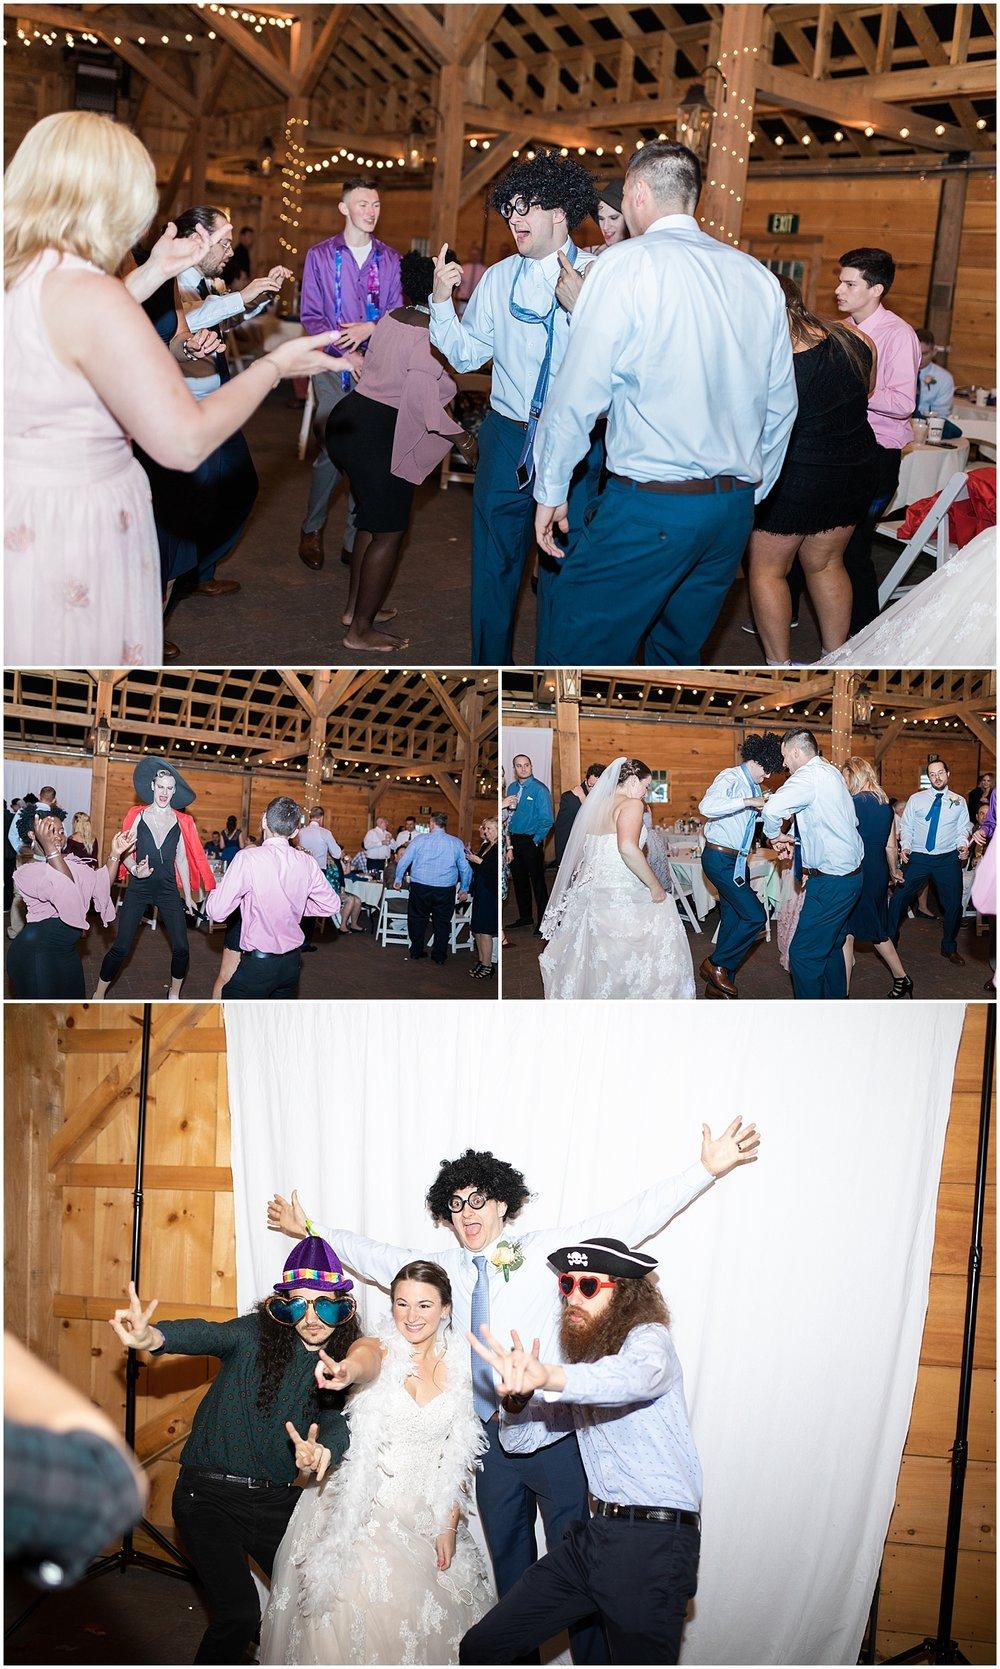 Fun reception dance photos by alyssa parker photogrpahy